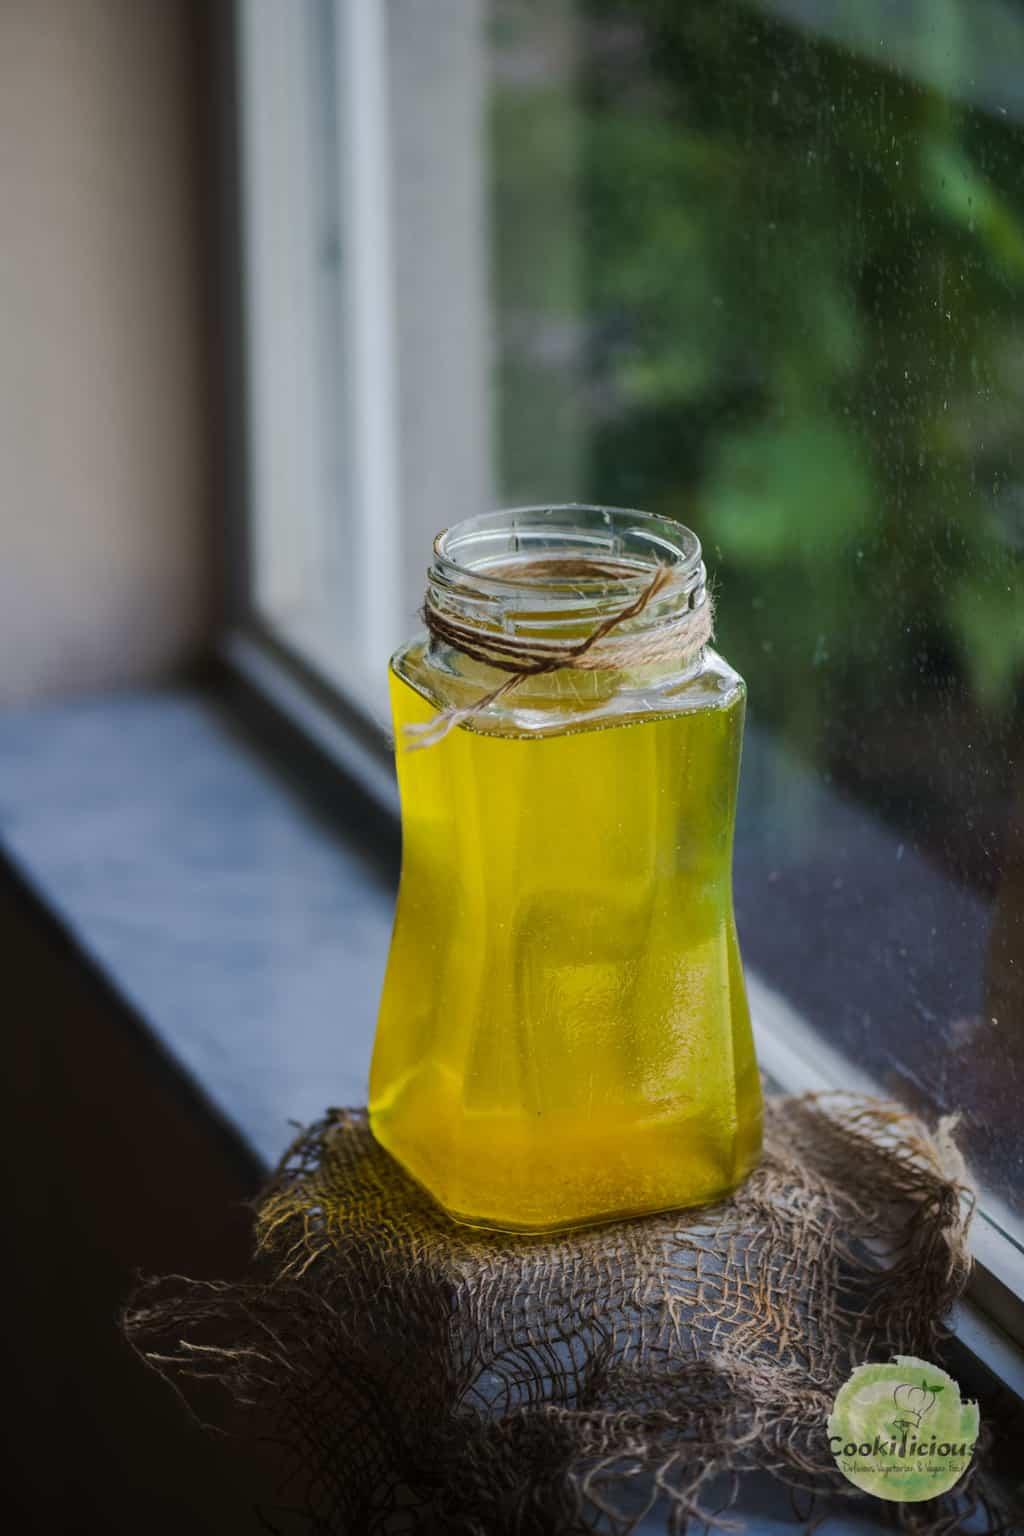 Vegan ghee in a jar placed on the window sill.